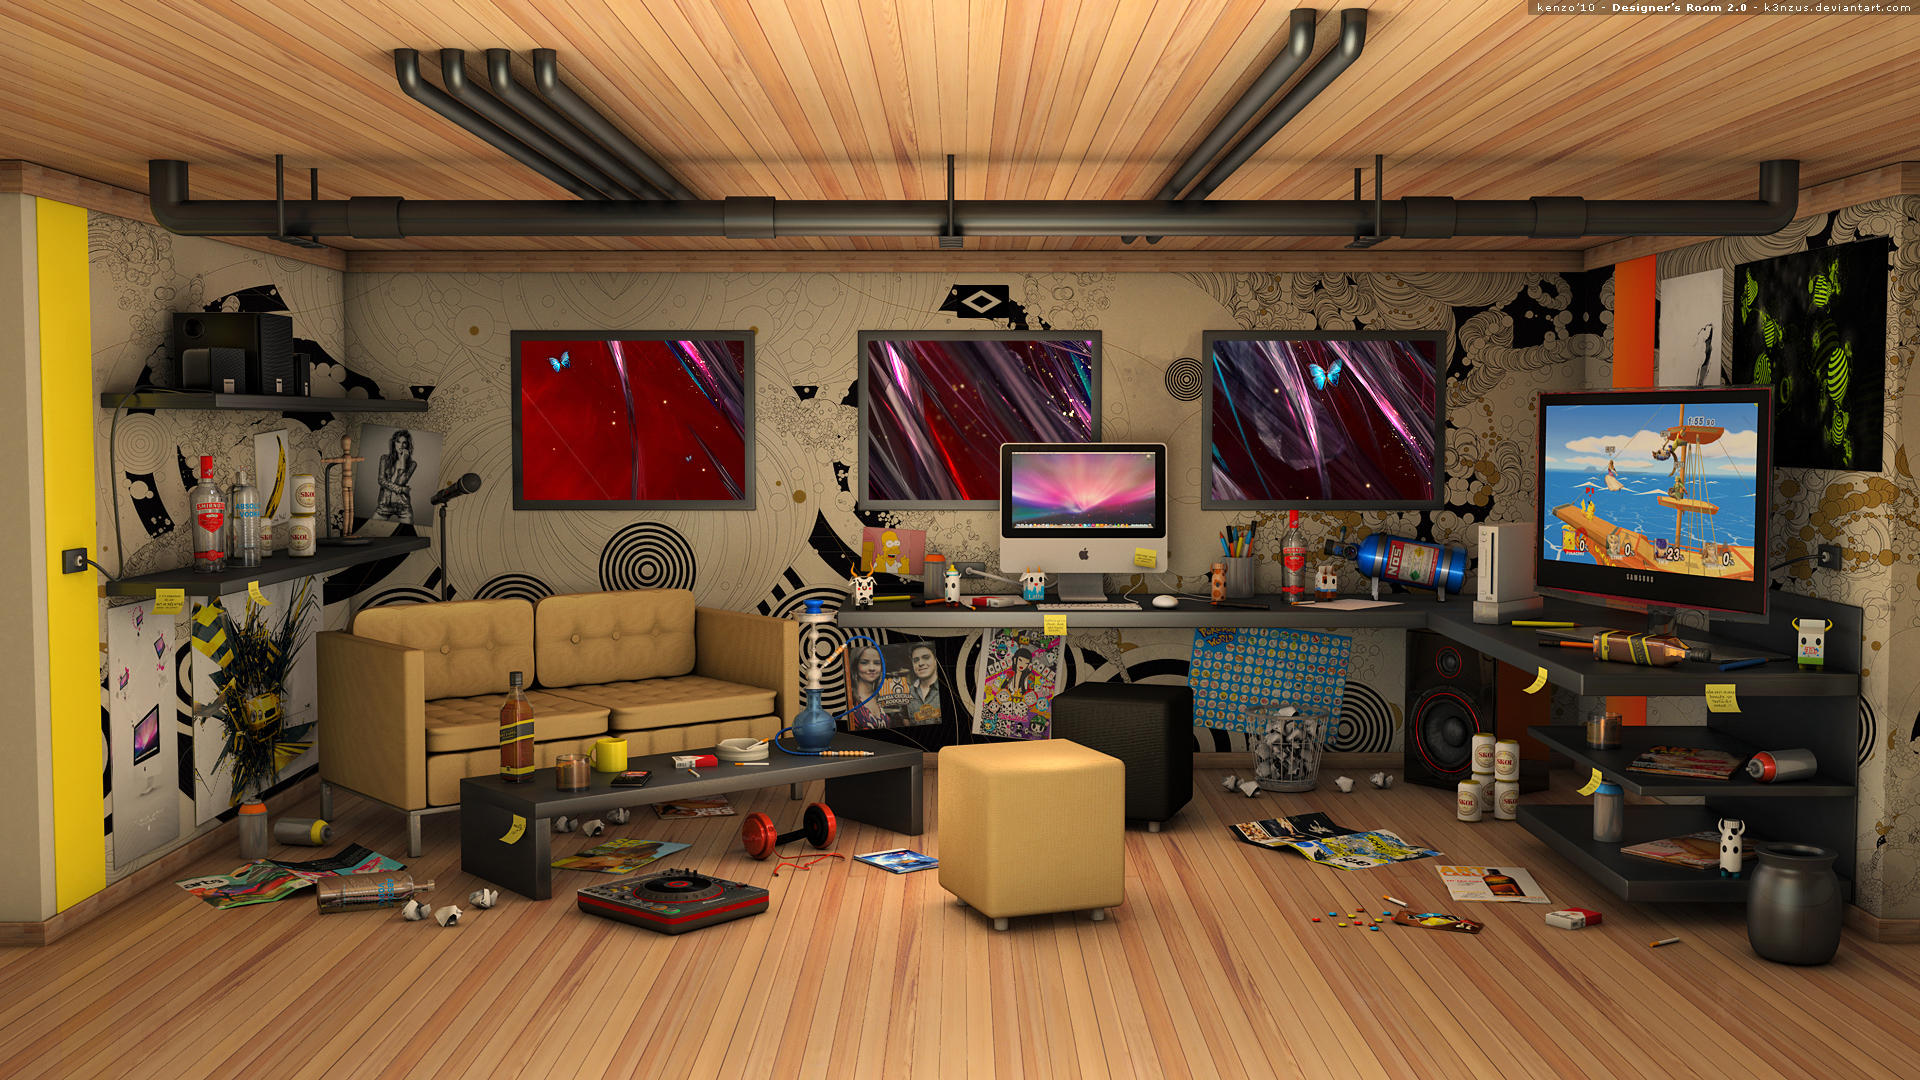 Designer s Room 2 0 by K3nzuS. Designer s Room by K3nzuS on DeviantArt